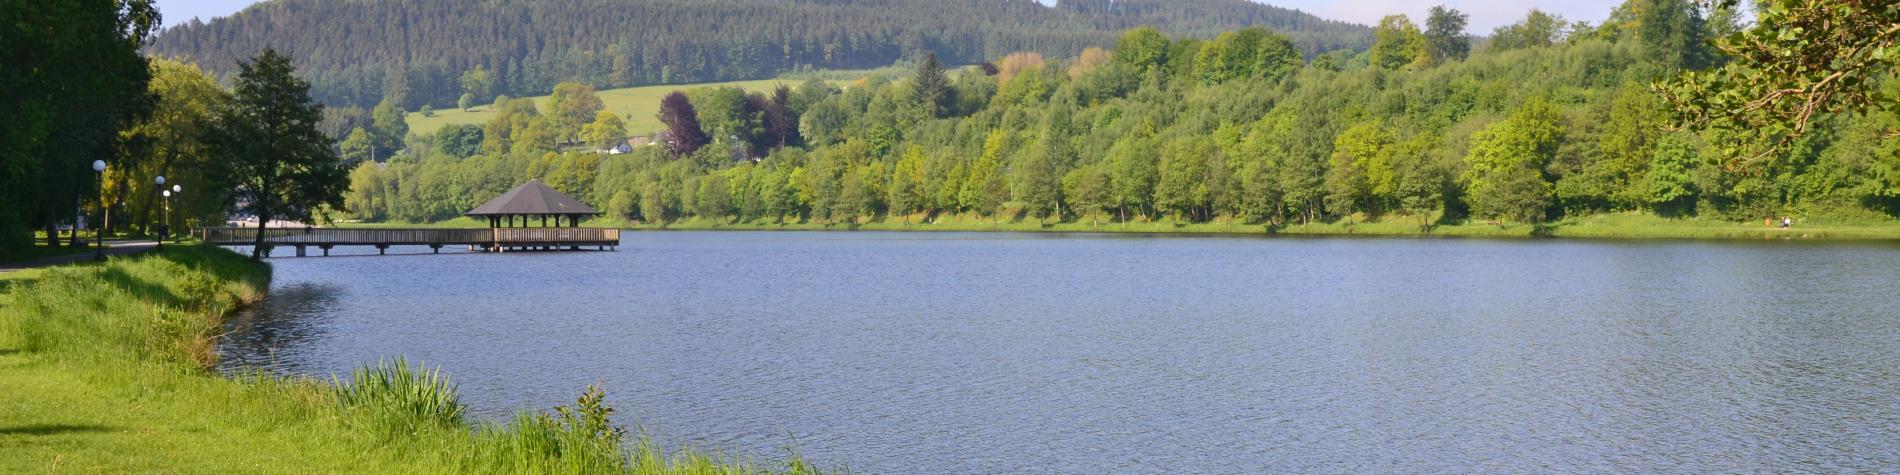 Syndicat d'Initiative - nature - Wallonie terre d'eau - Luxembourg